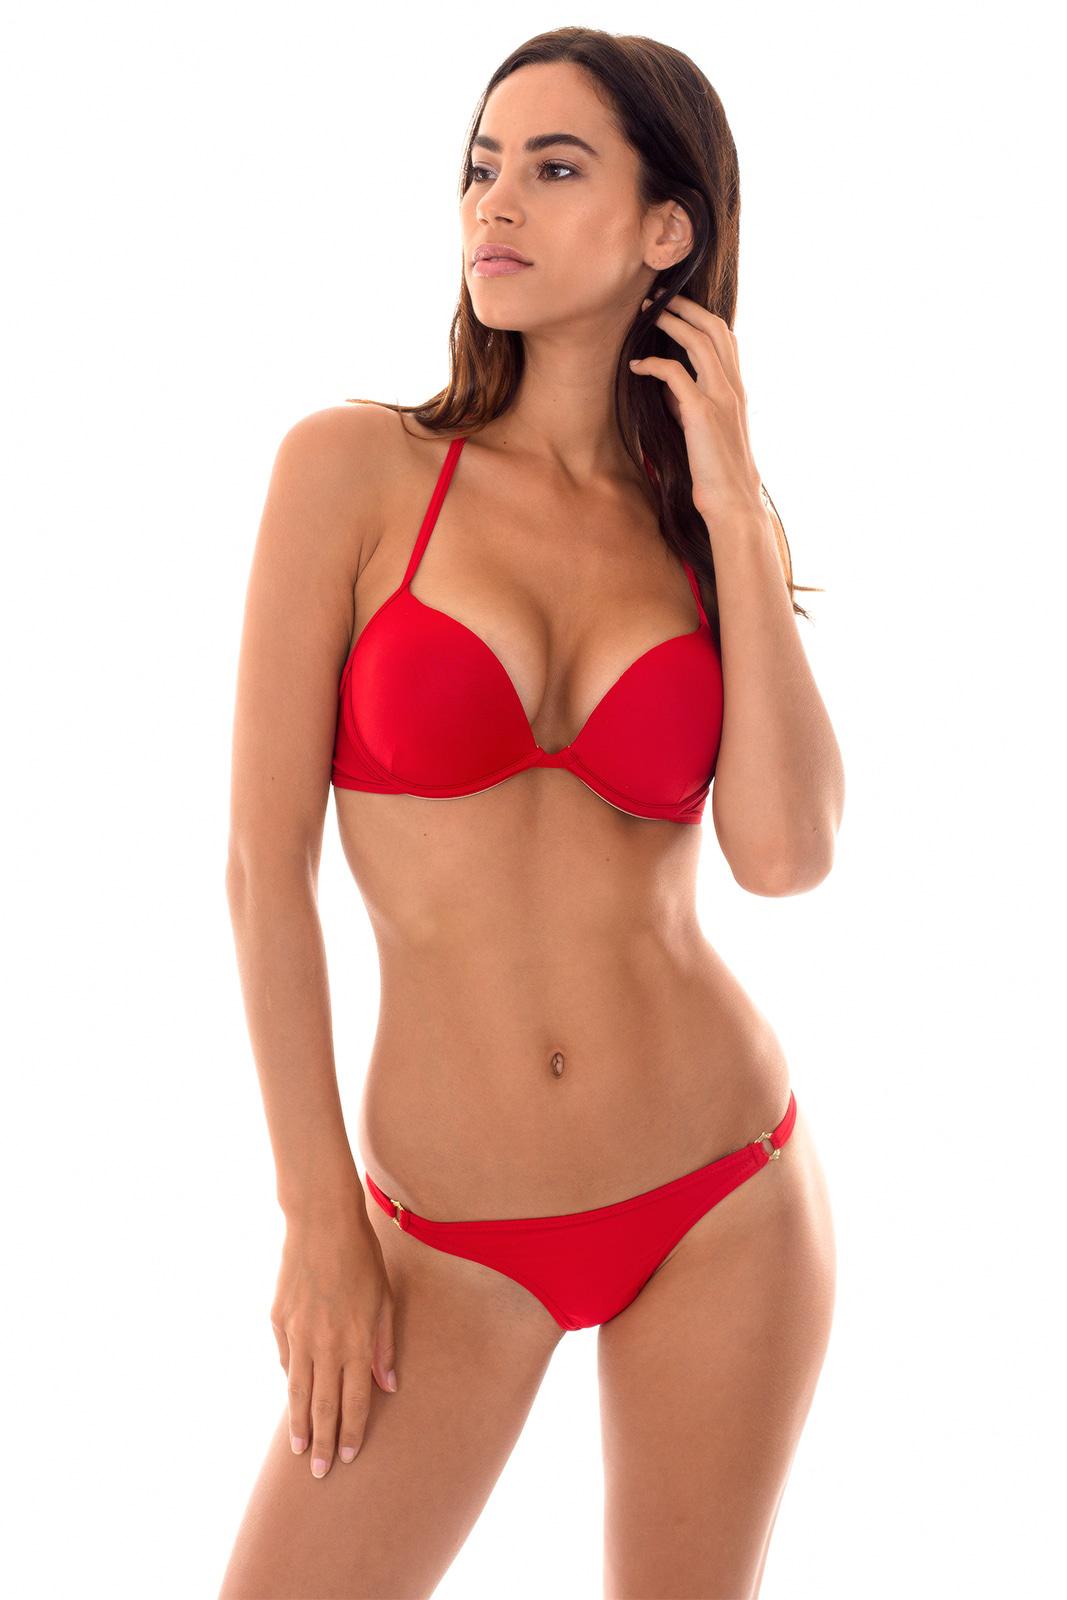 red adjustable string bikini with push up top vermelho super. Black Bedroom Furniture Sets. Home Design Ideas